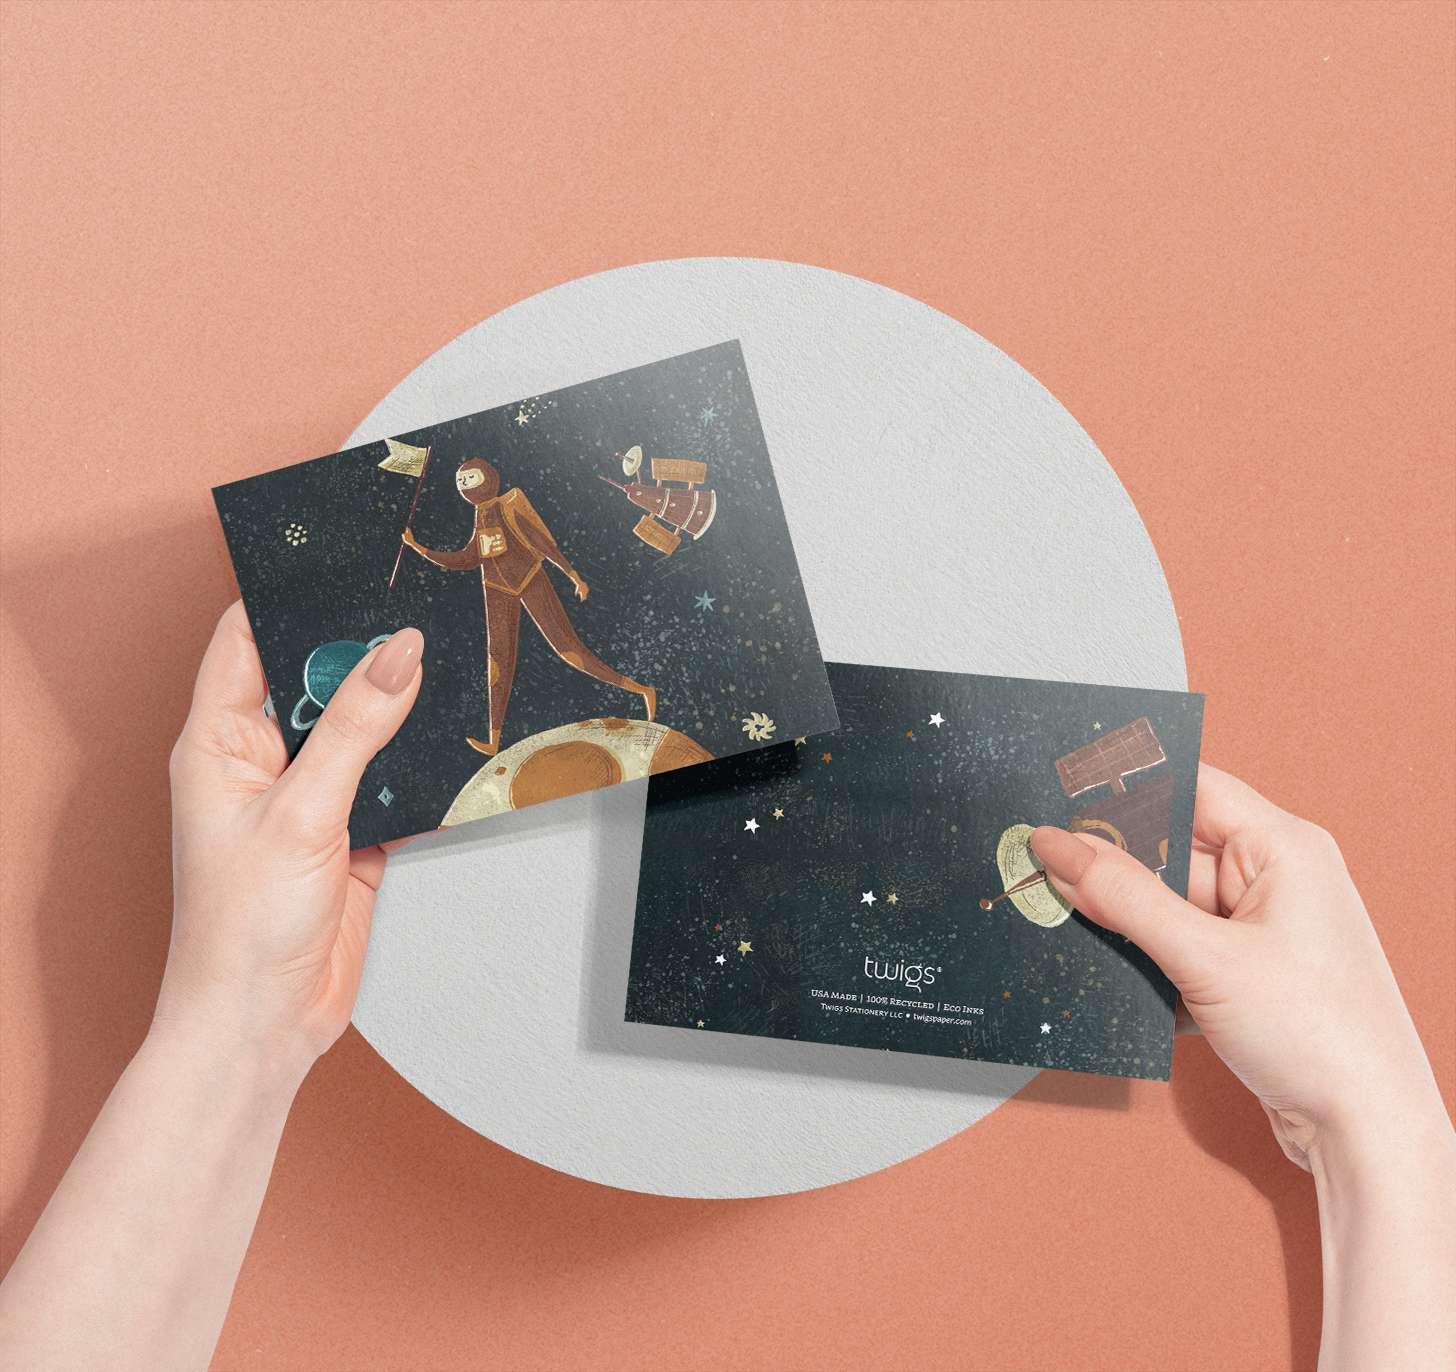 Woman's hand holding Astronaut on moon design card